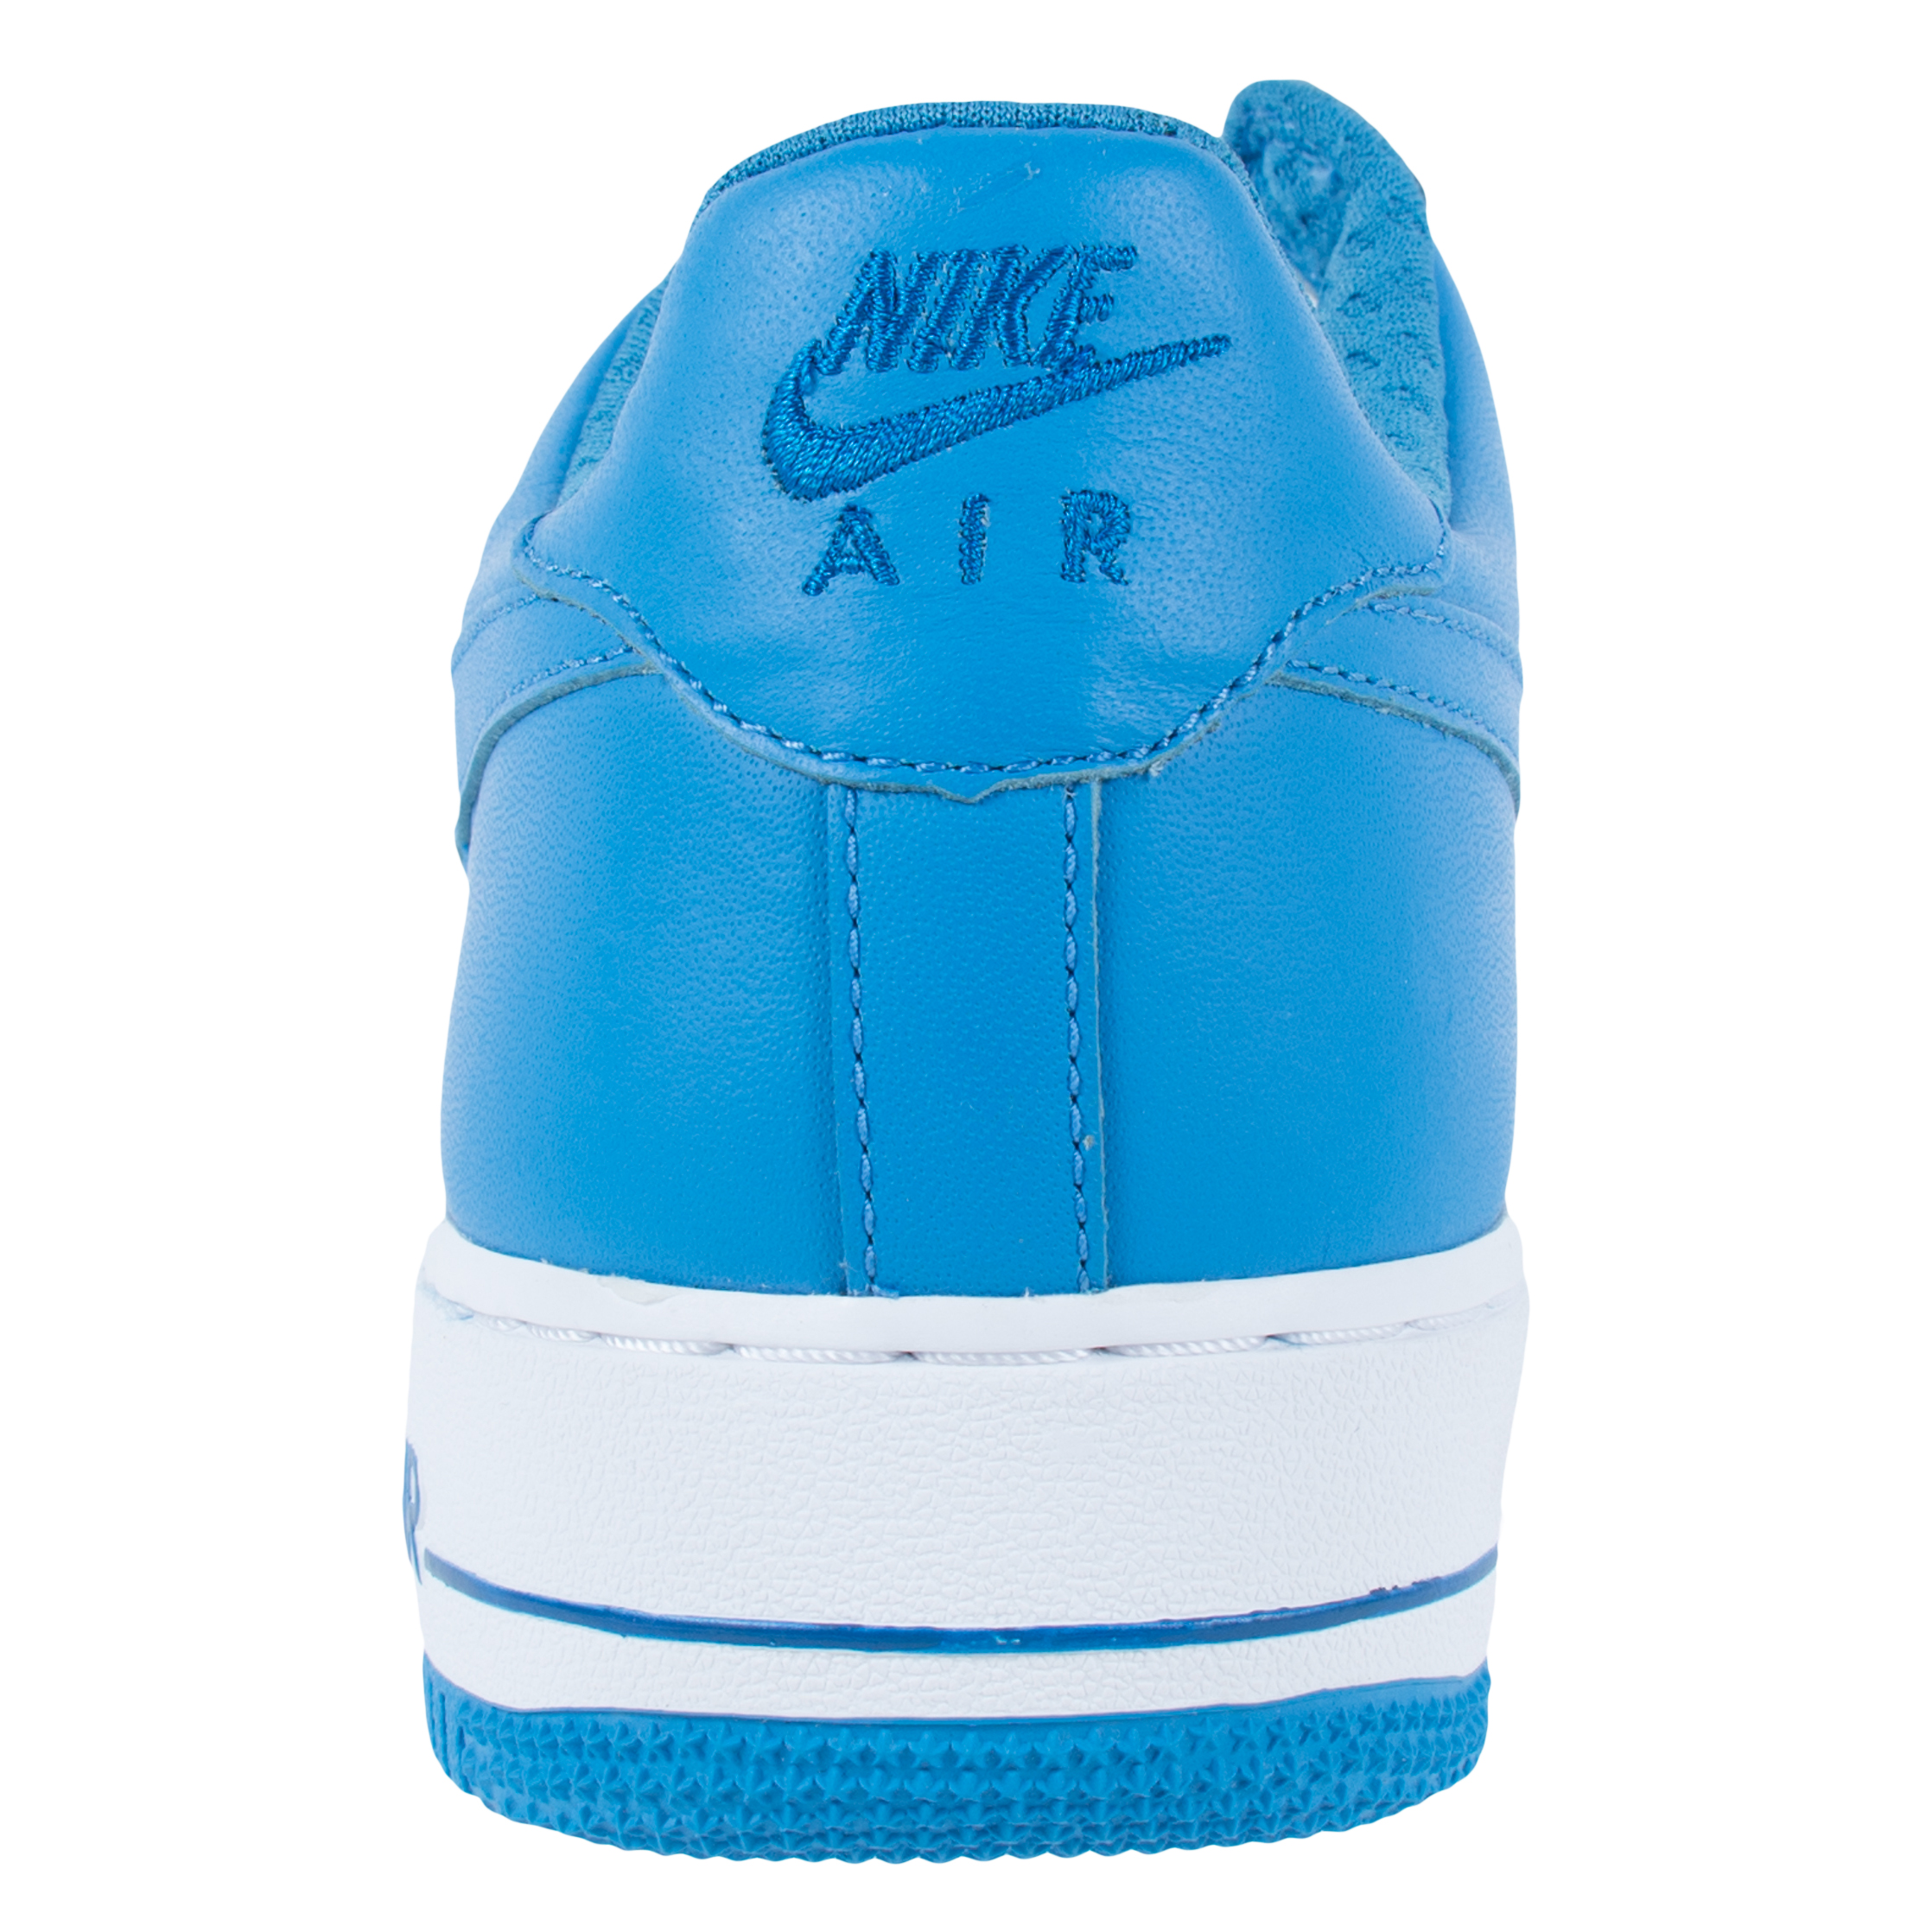 Nike Air Force 25 Coast 2 C2C Mens Shoes 12 Red White Blue High